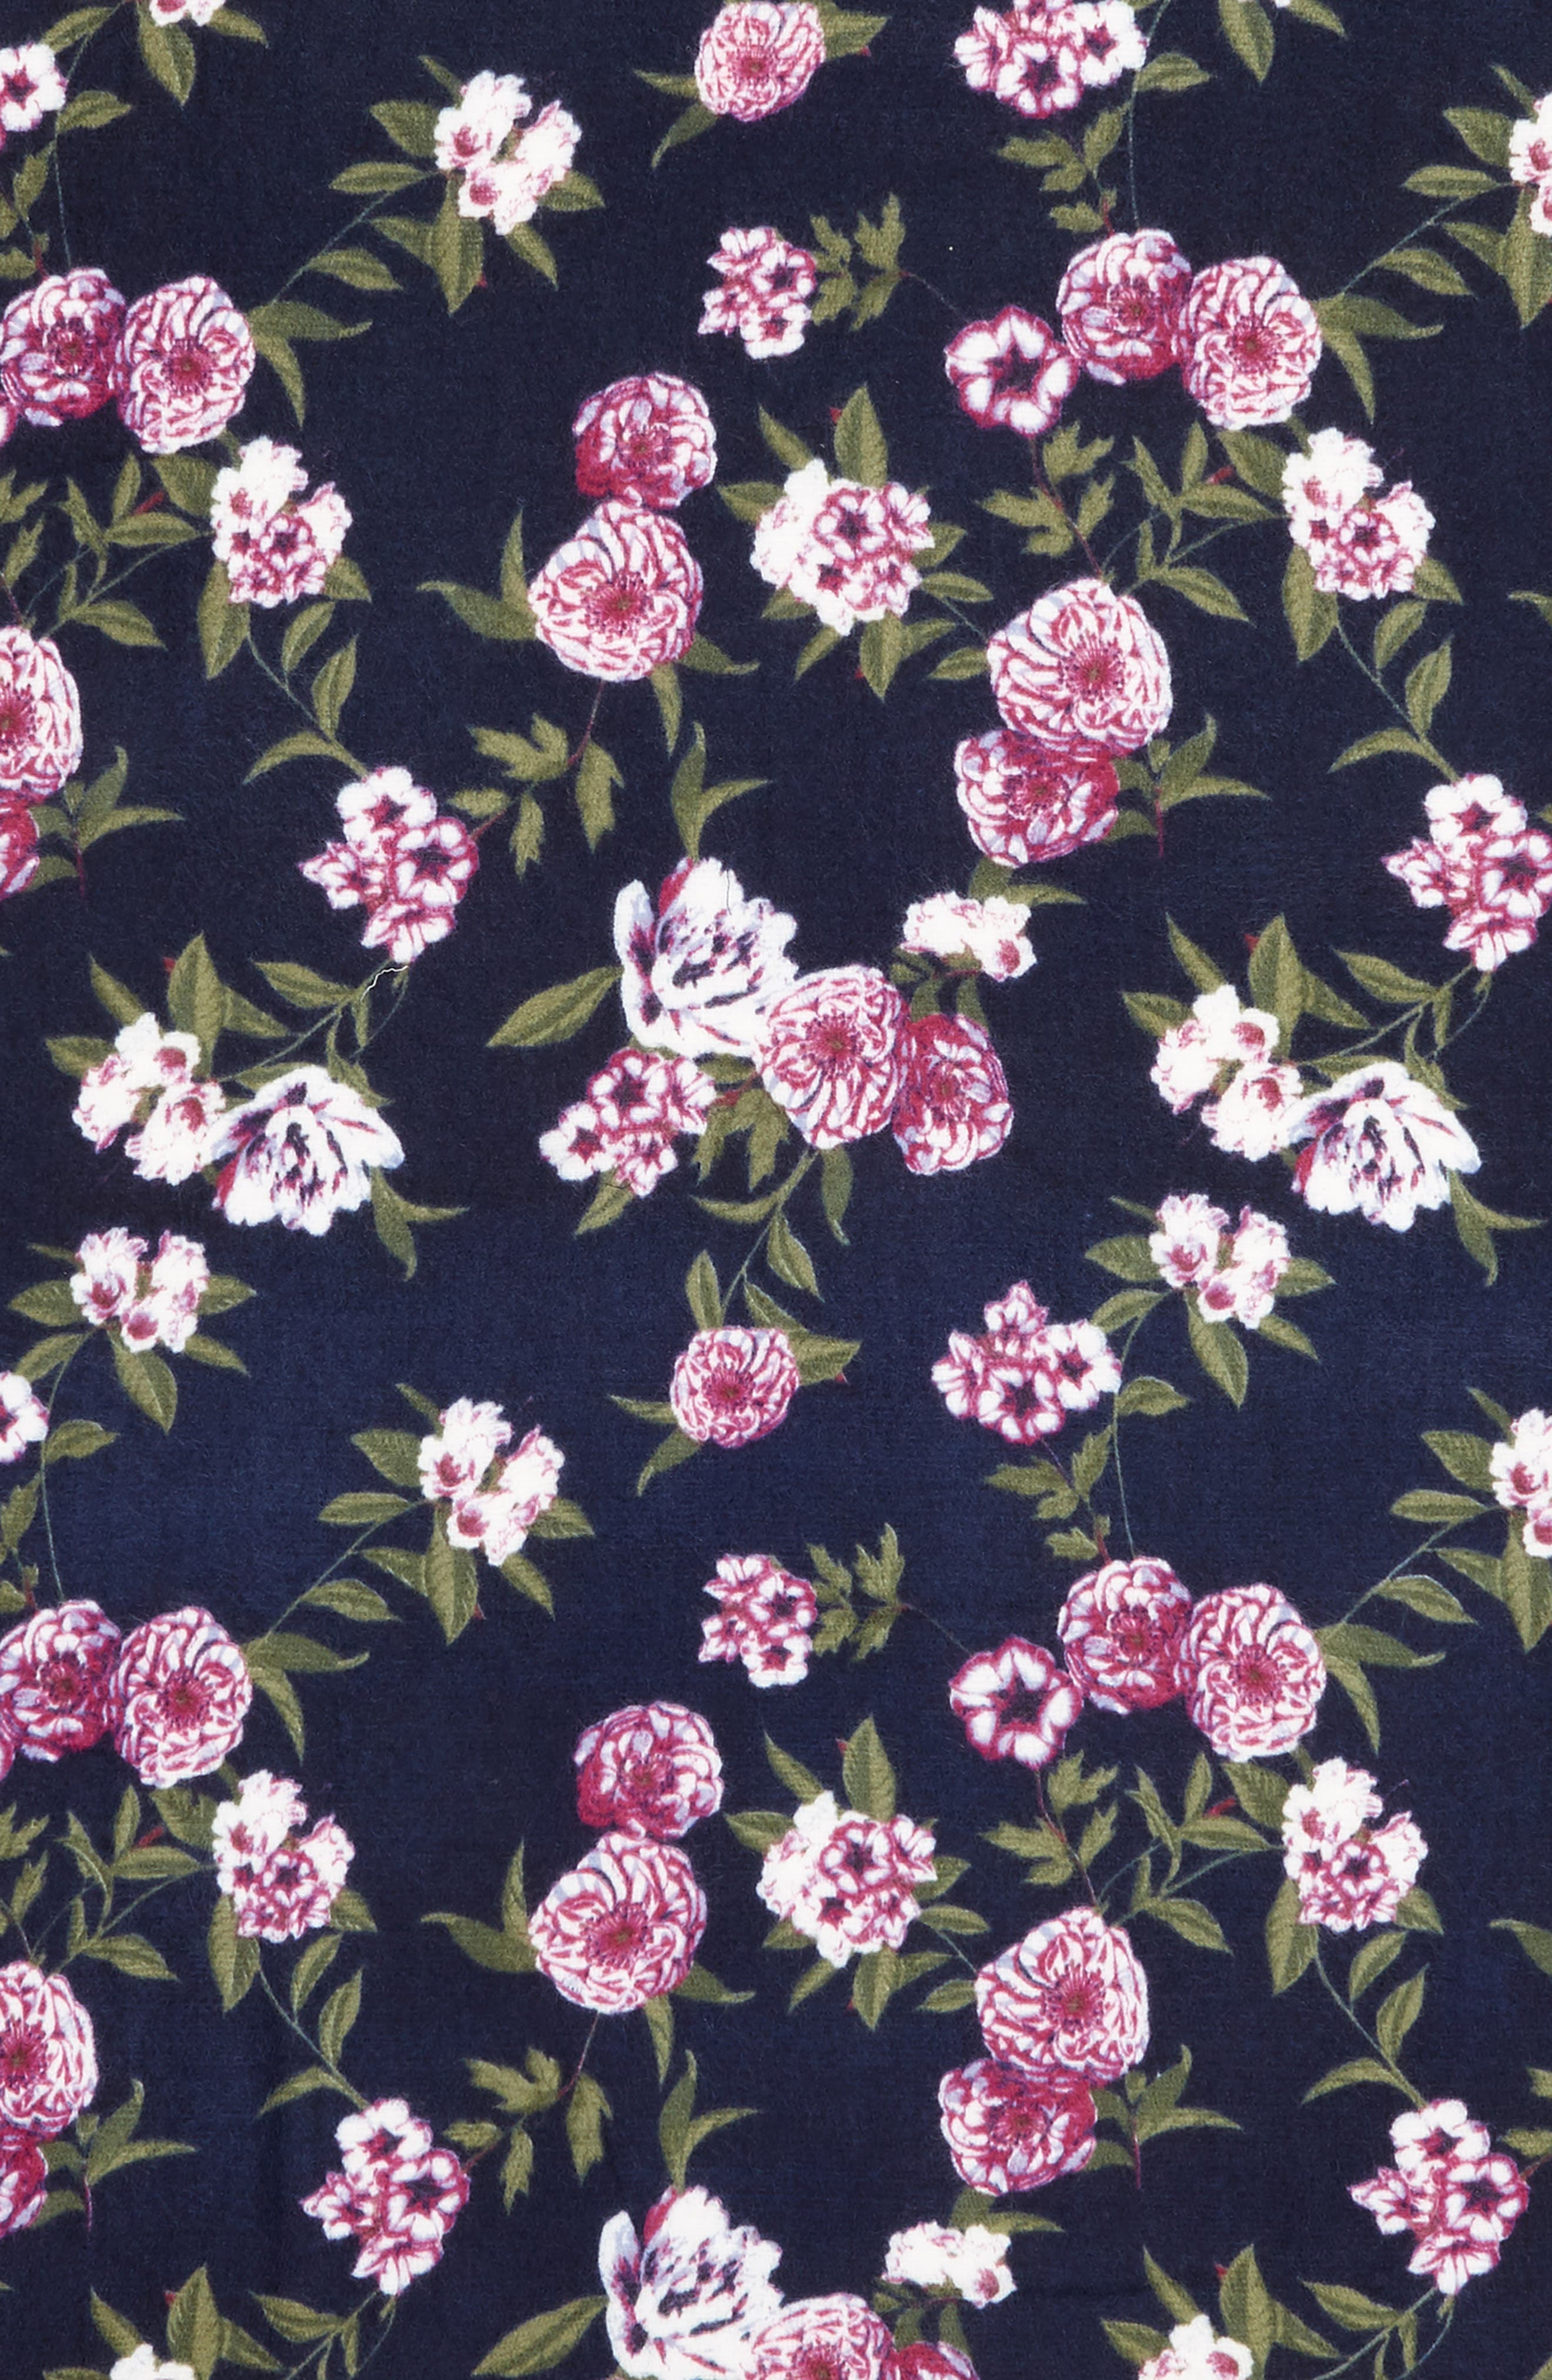 Floral Scarf,                             Alternate thumbnail 4, color,                             NAVY FOLK FLORAL